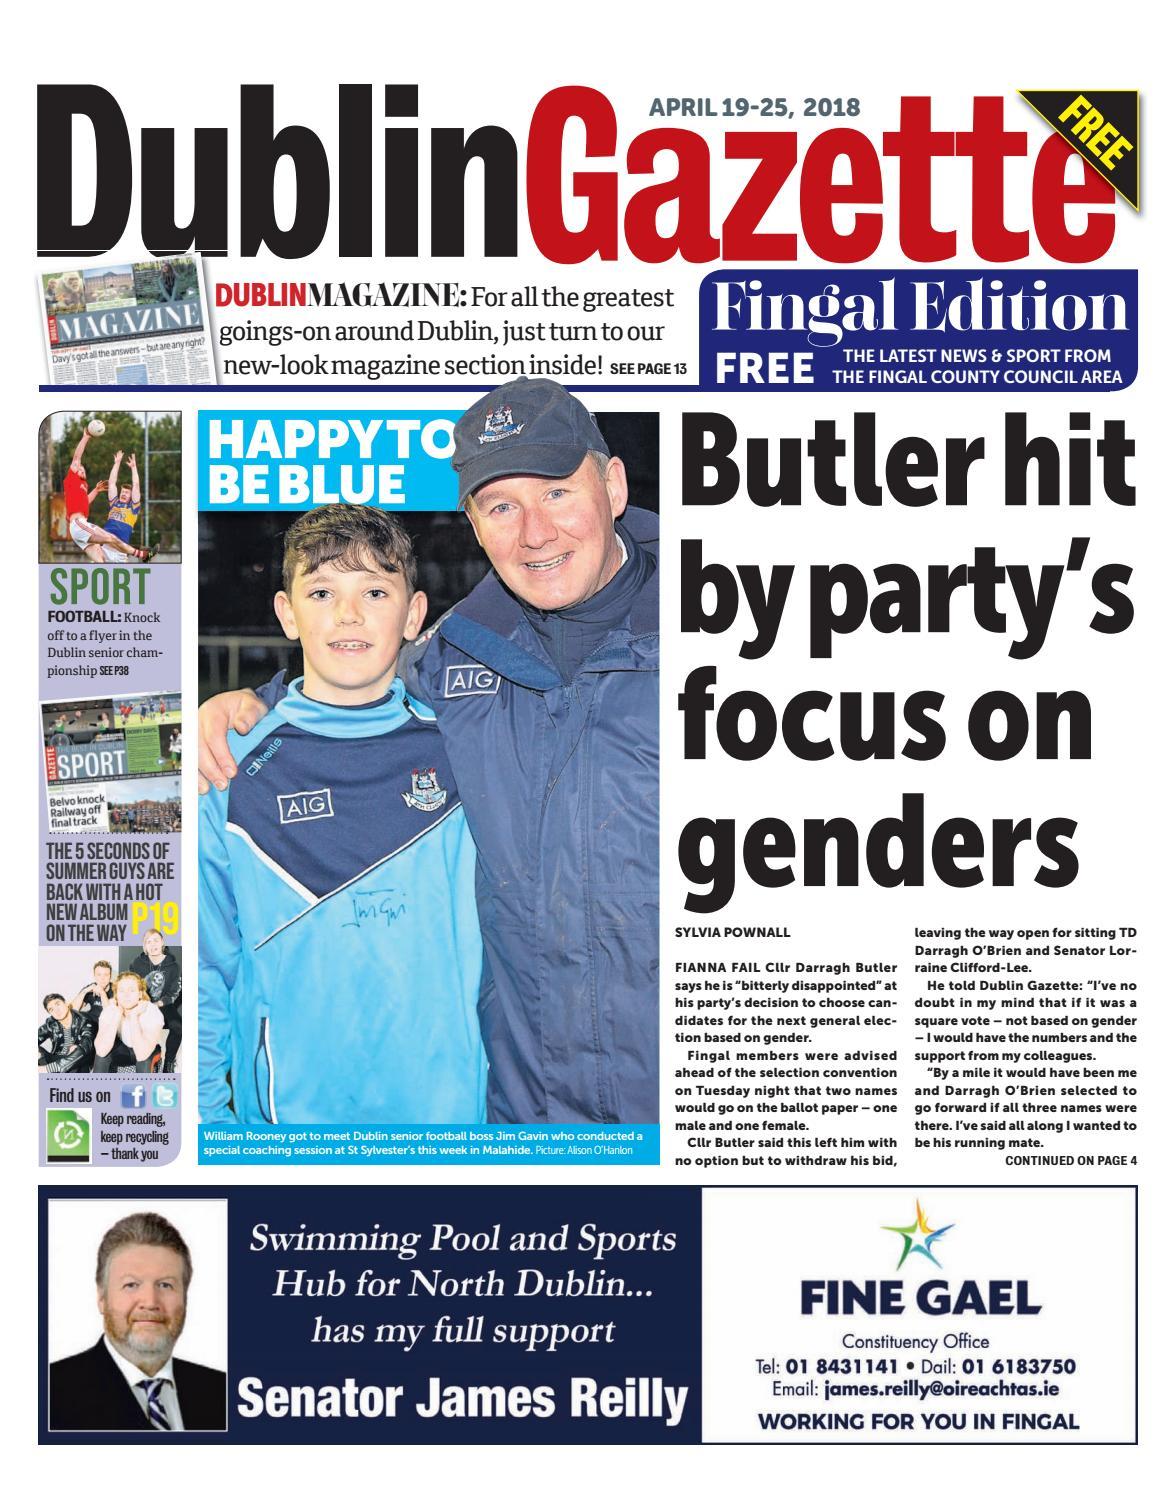 Dublin Gazette Fingal Edition by Dublin Gazette - issuu